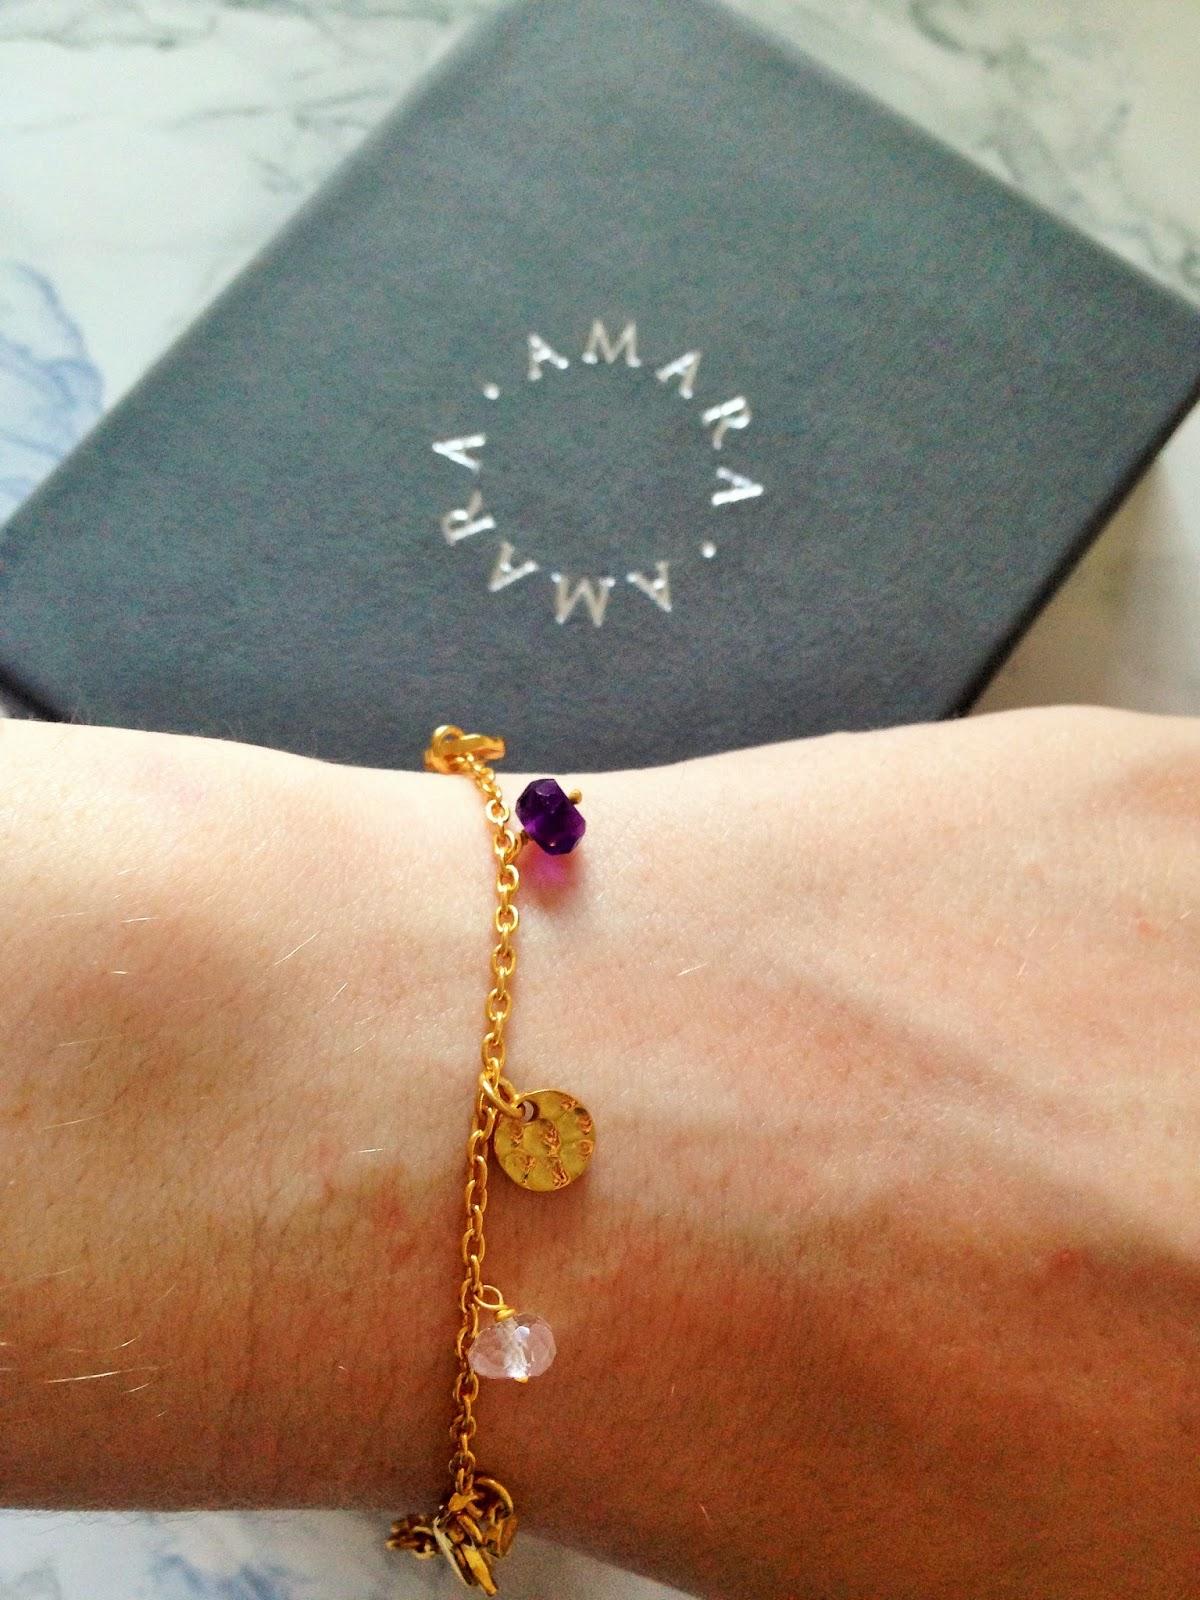 Amara Amara Jewellery Review and Treasure Hunt